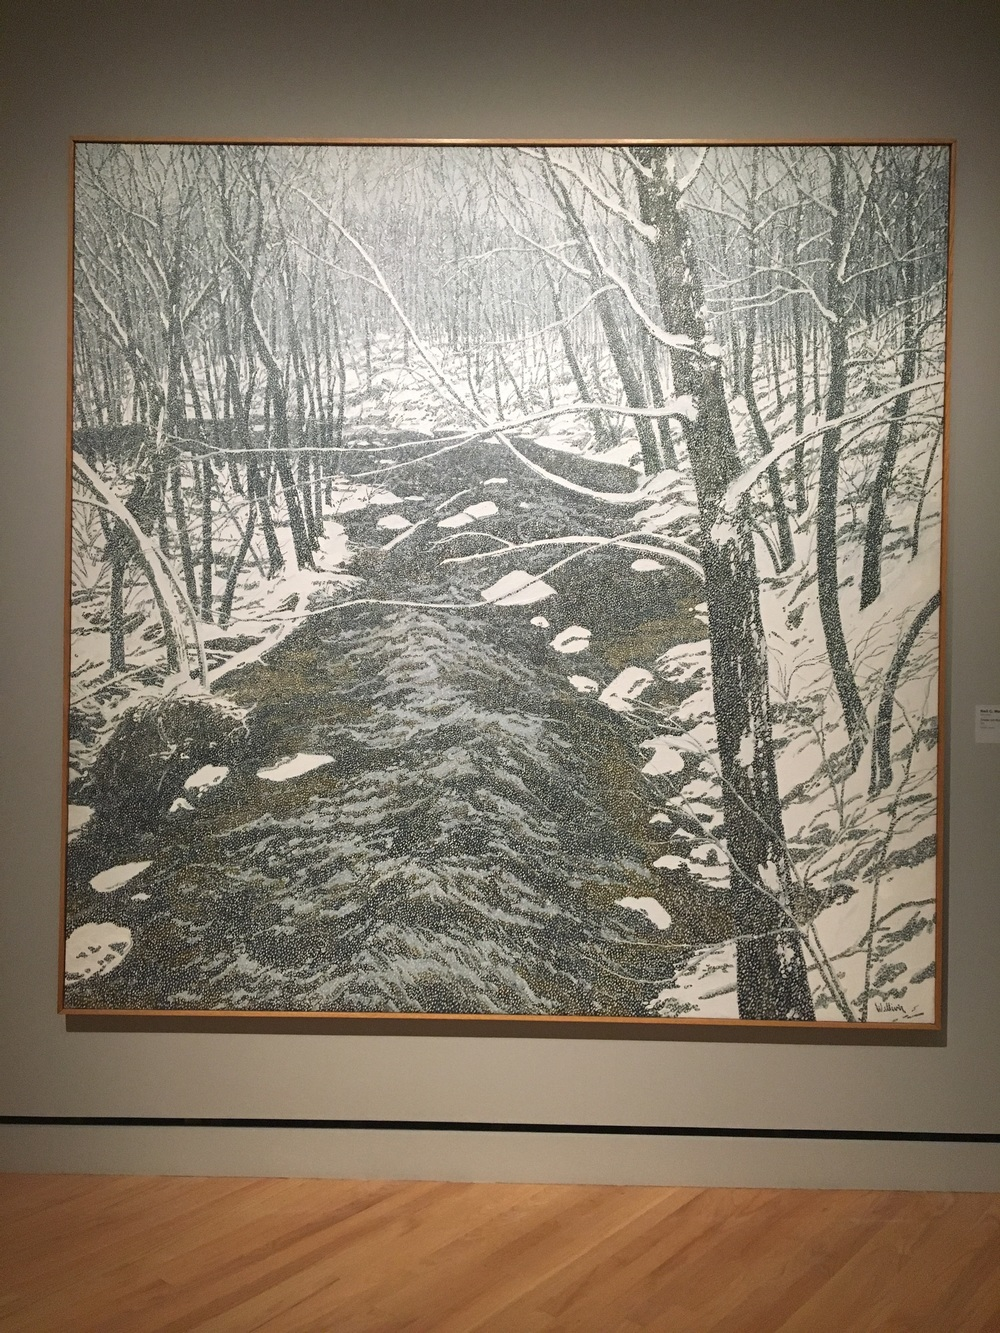 Neil G. Welliver. 1929-2005. Snow on Alden Brook, 1983.